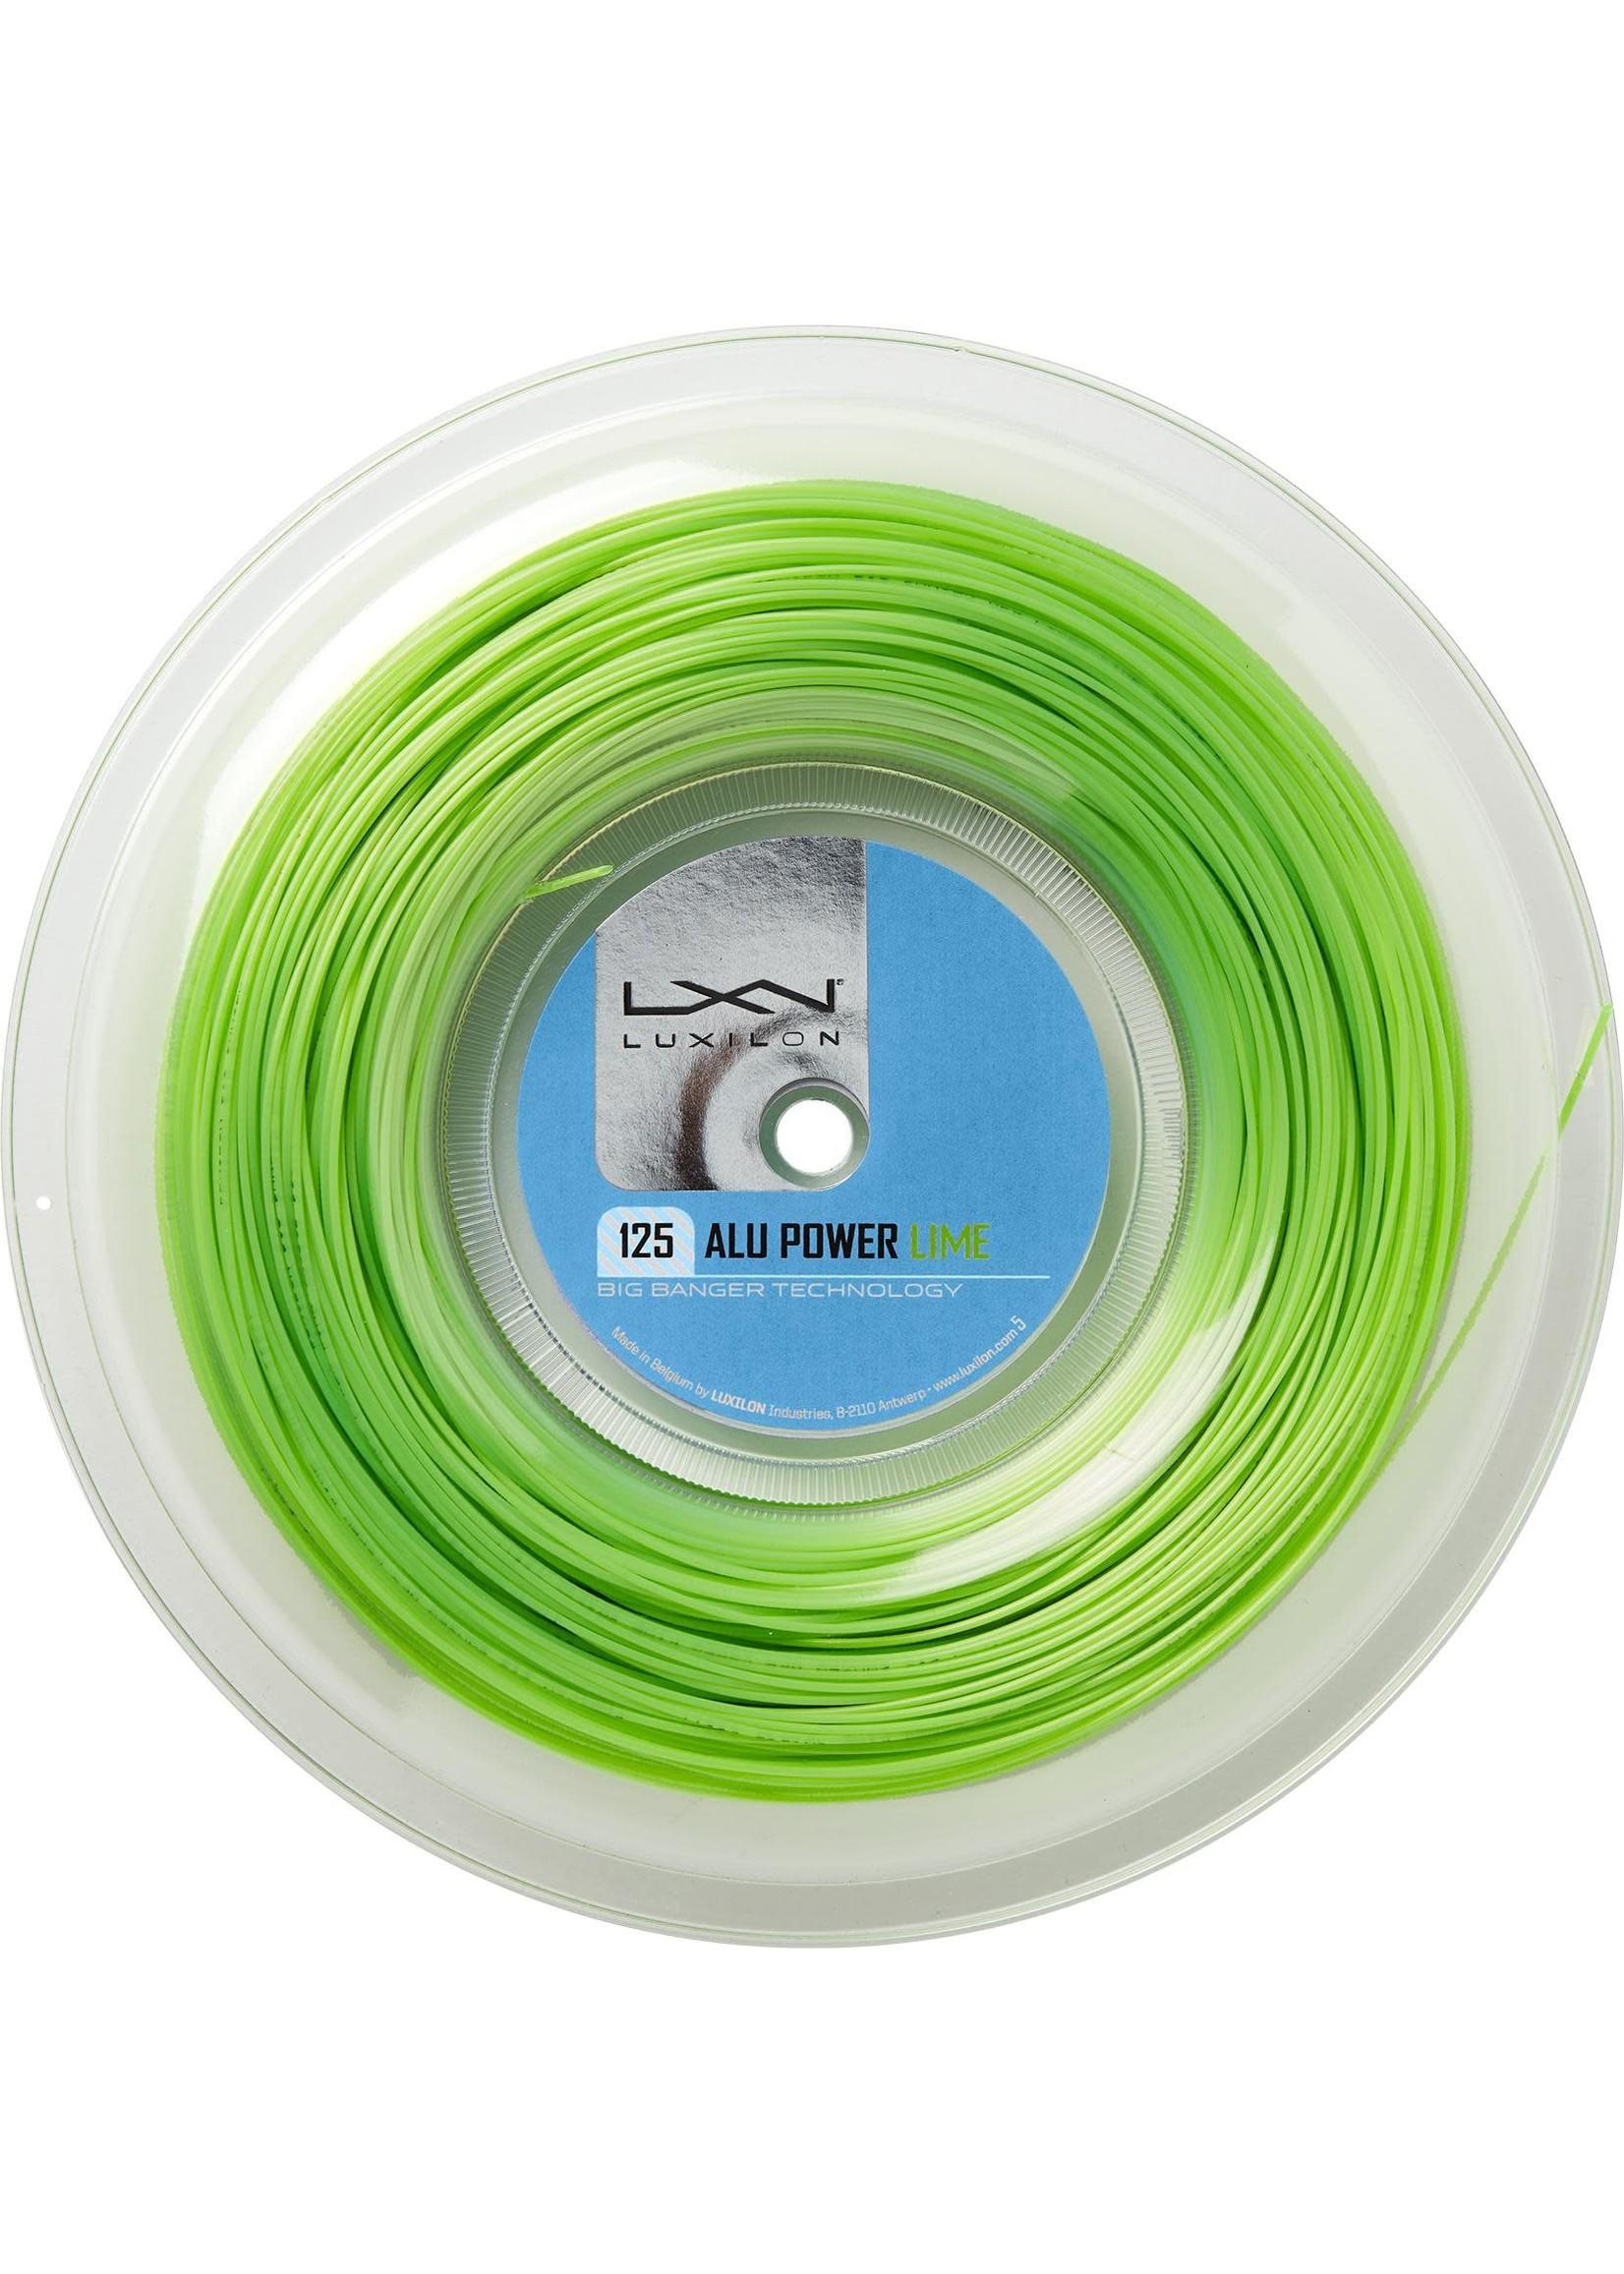 Luxilon Luxilon Alu Power 125 200m Reel, Lime (2020)